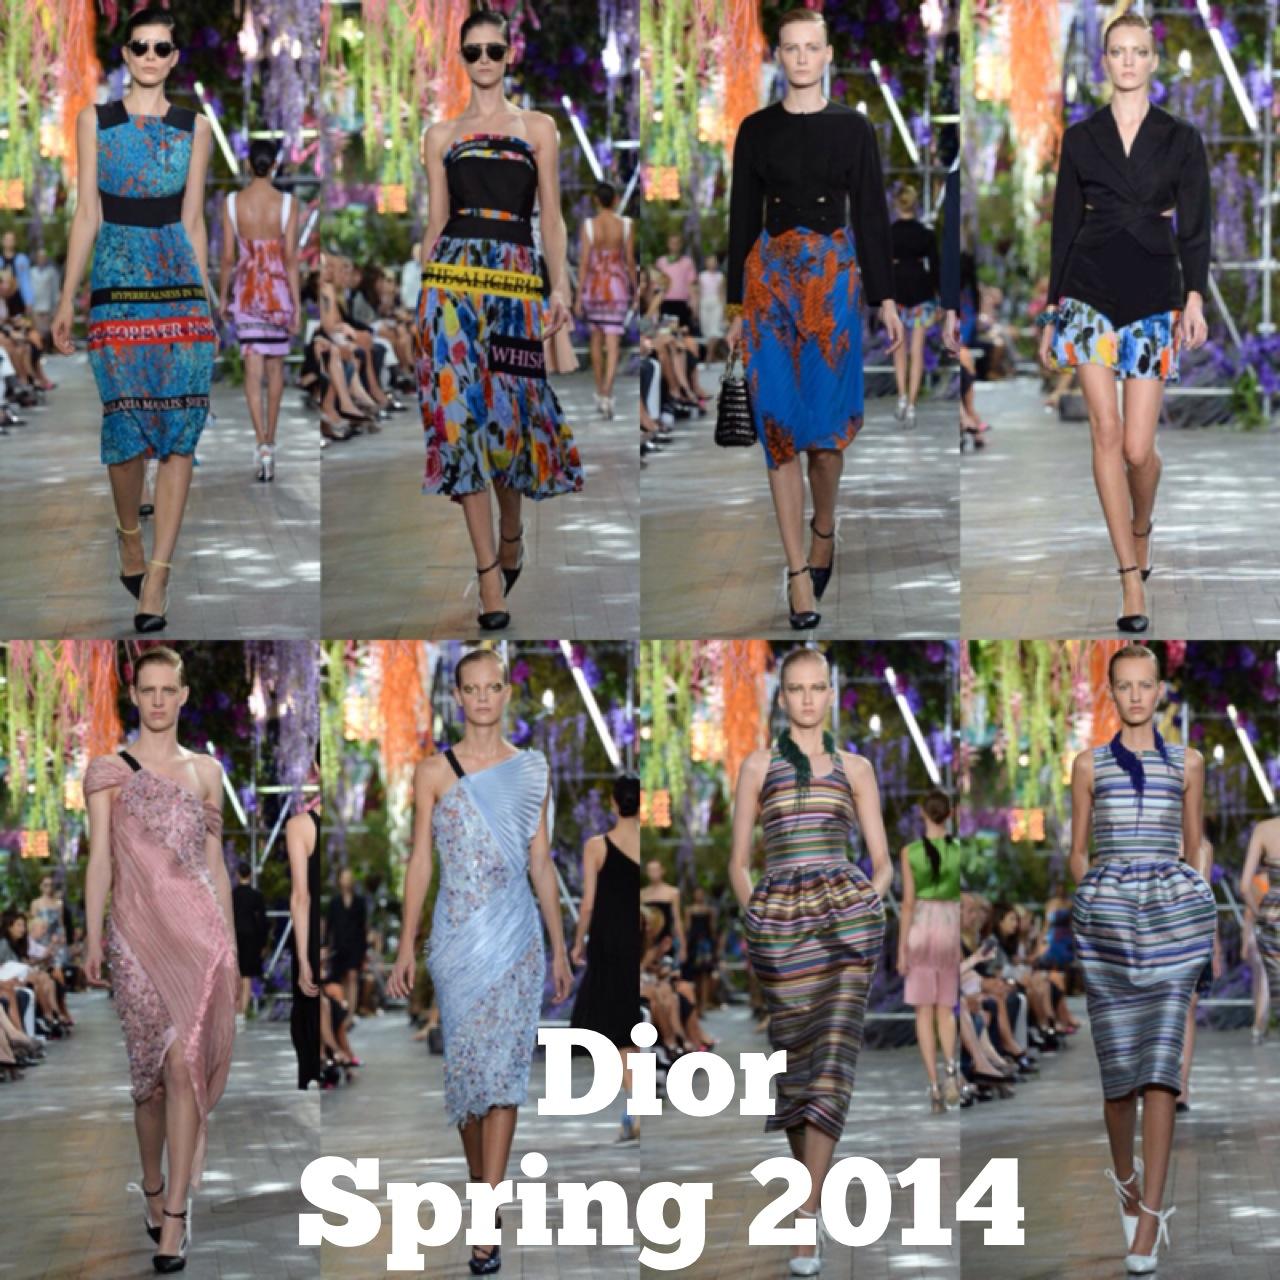 Spring 2014 Dior